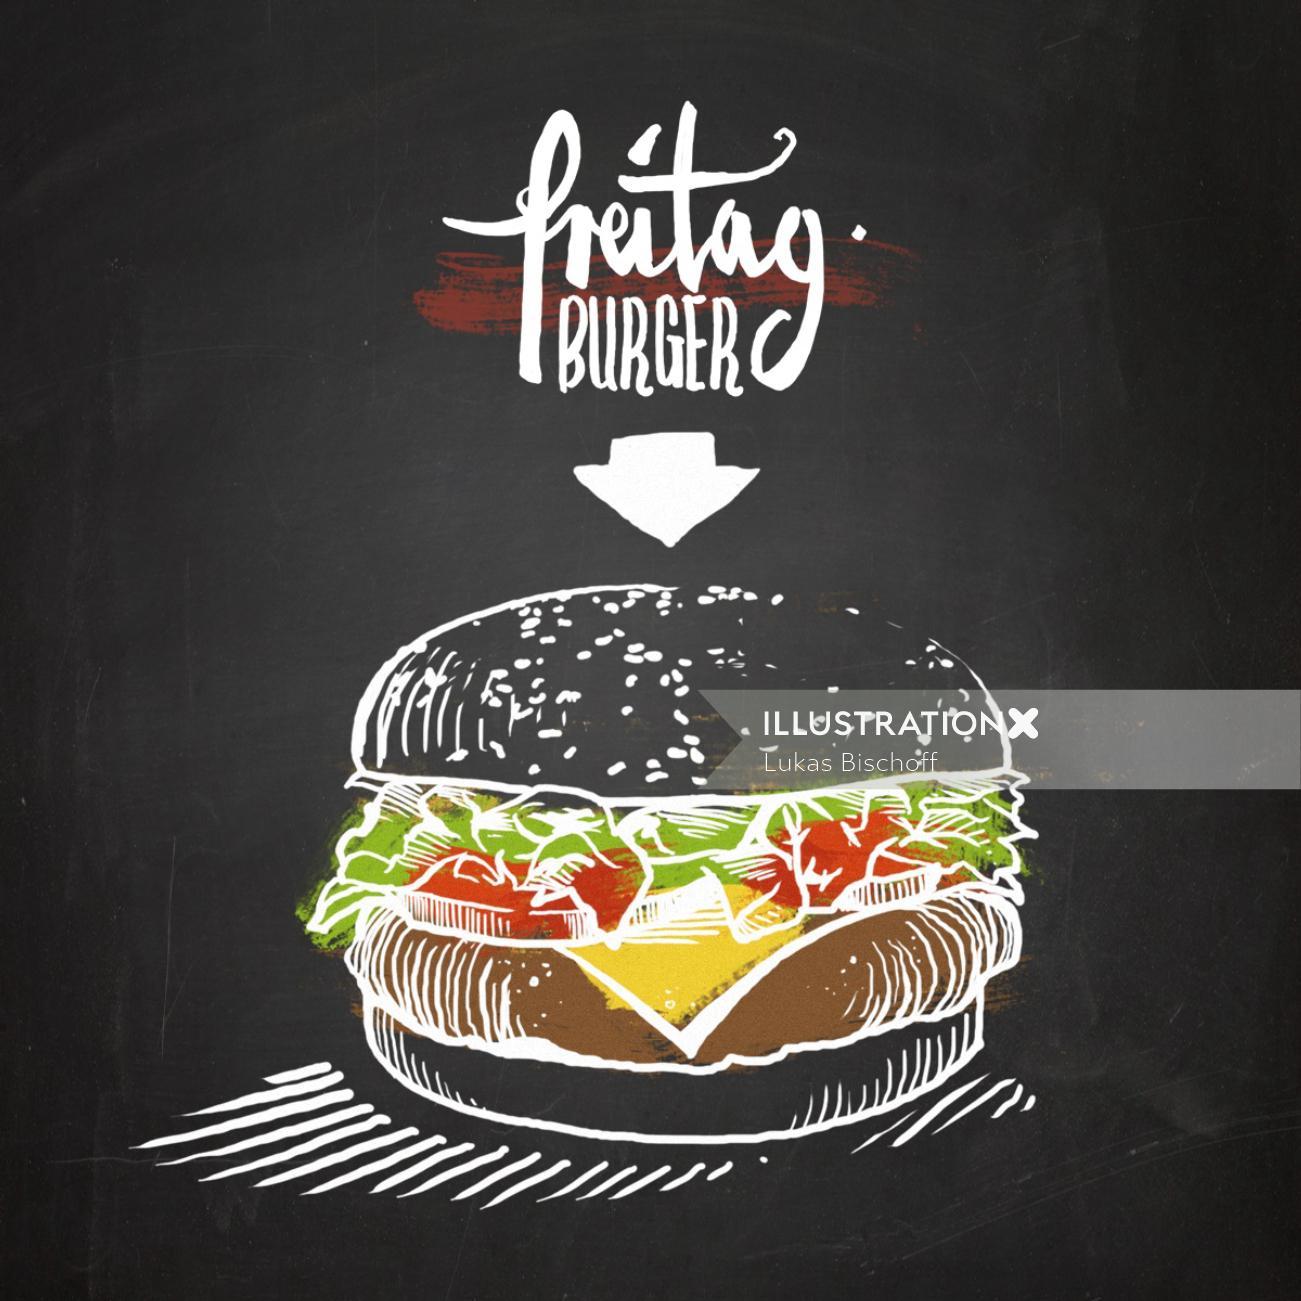 Preitag burger illustration